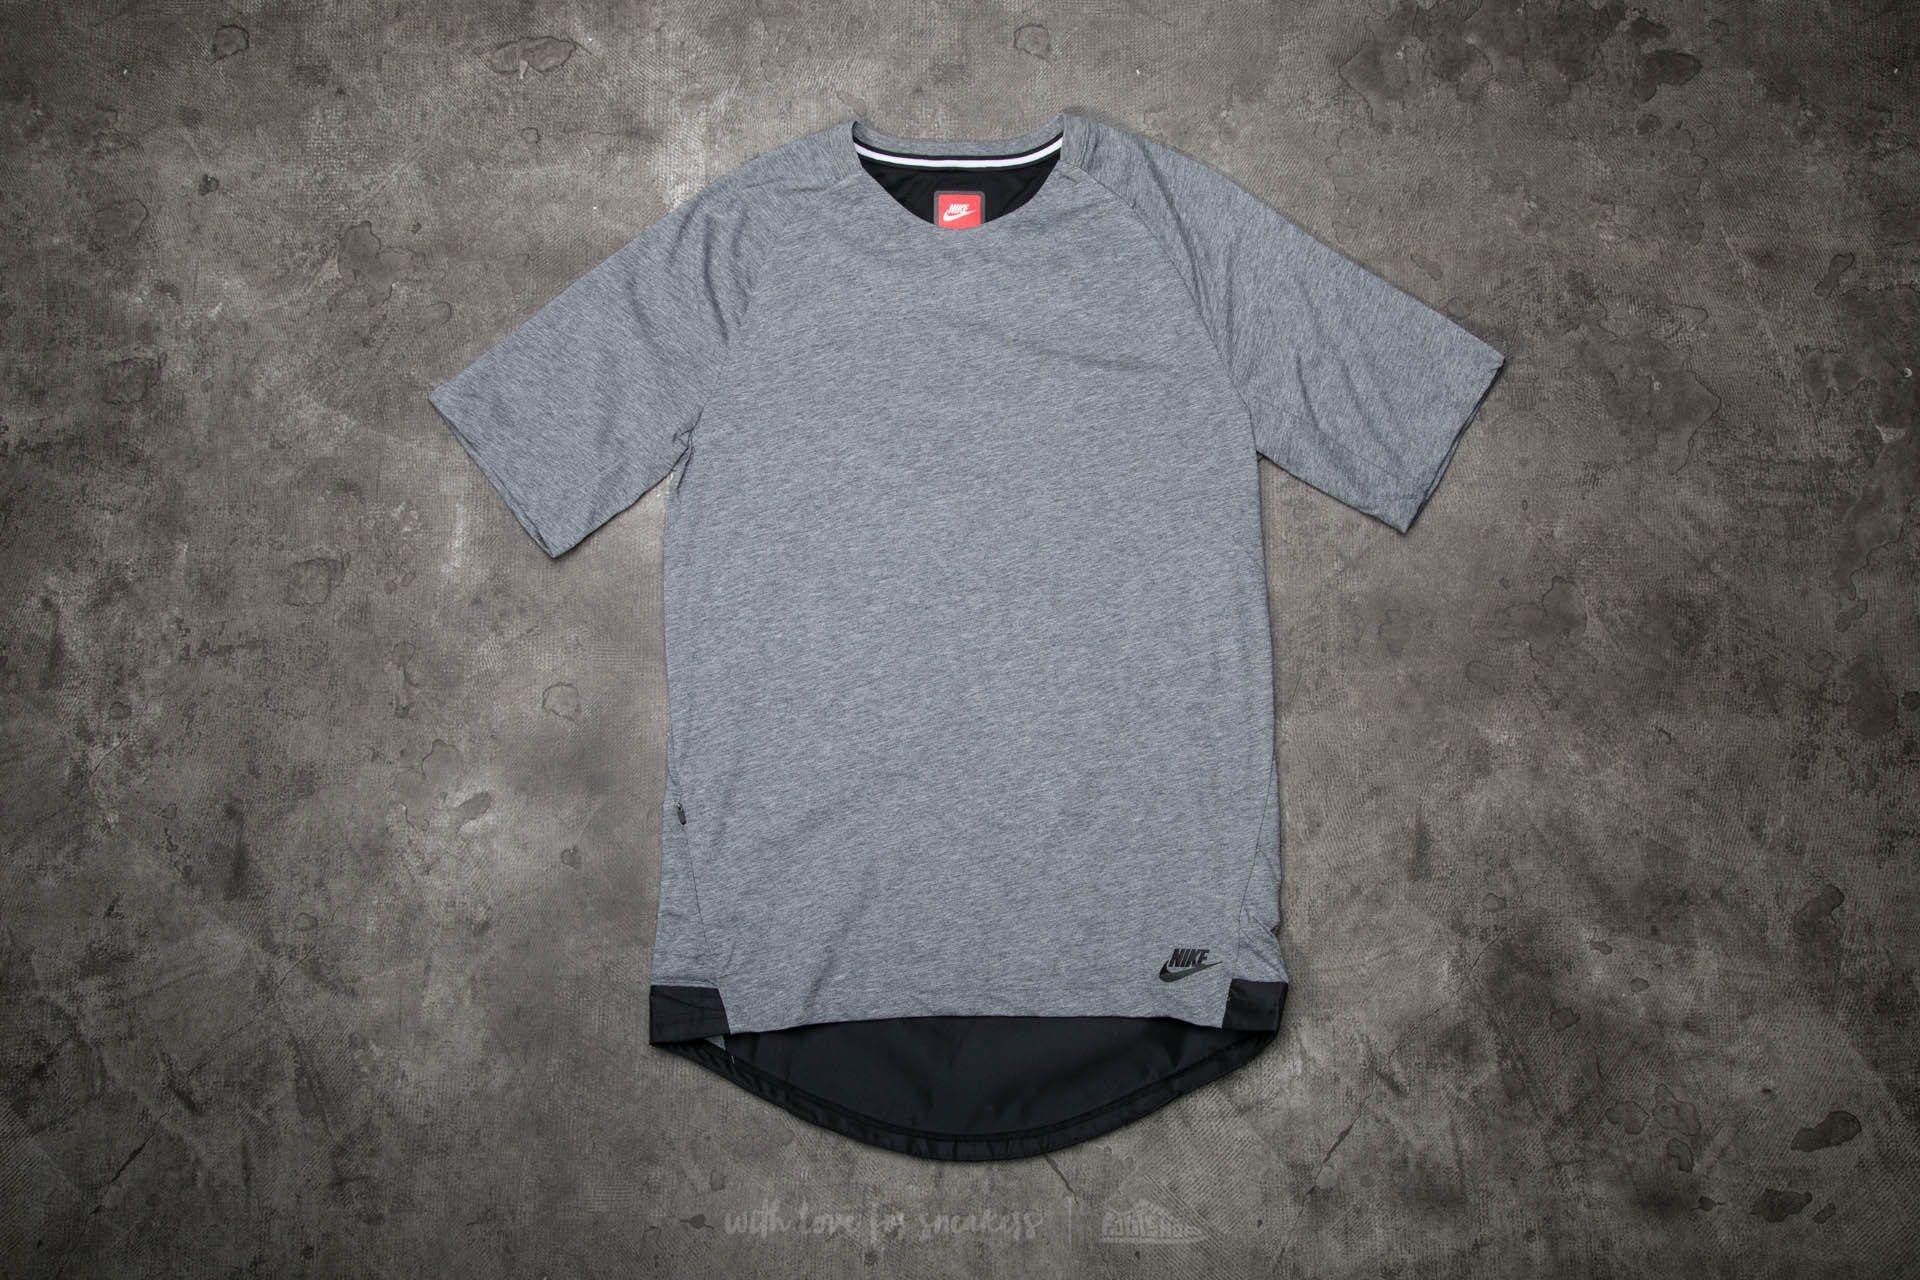 Nike Sportwear Bonded Short Sleeve Top Grey